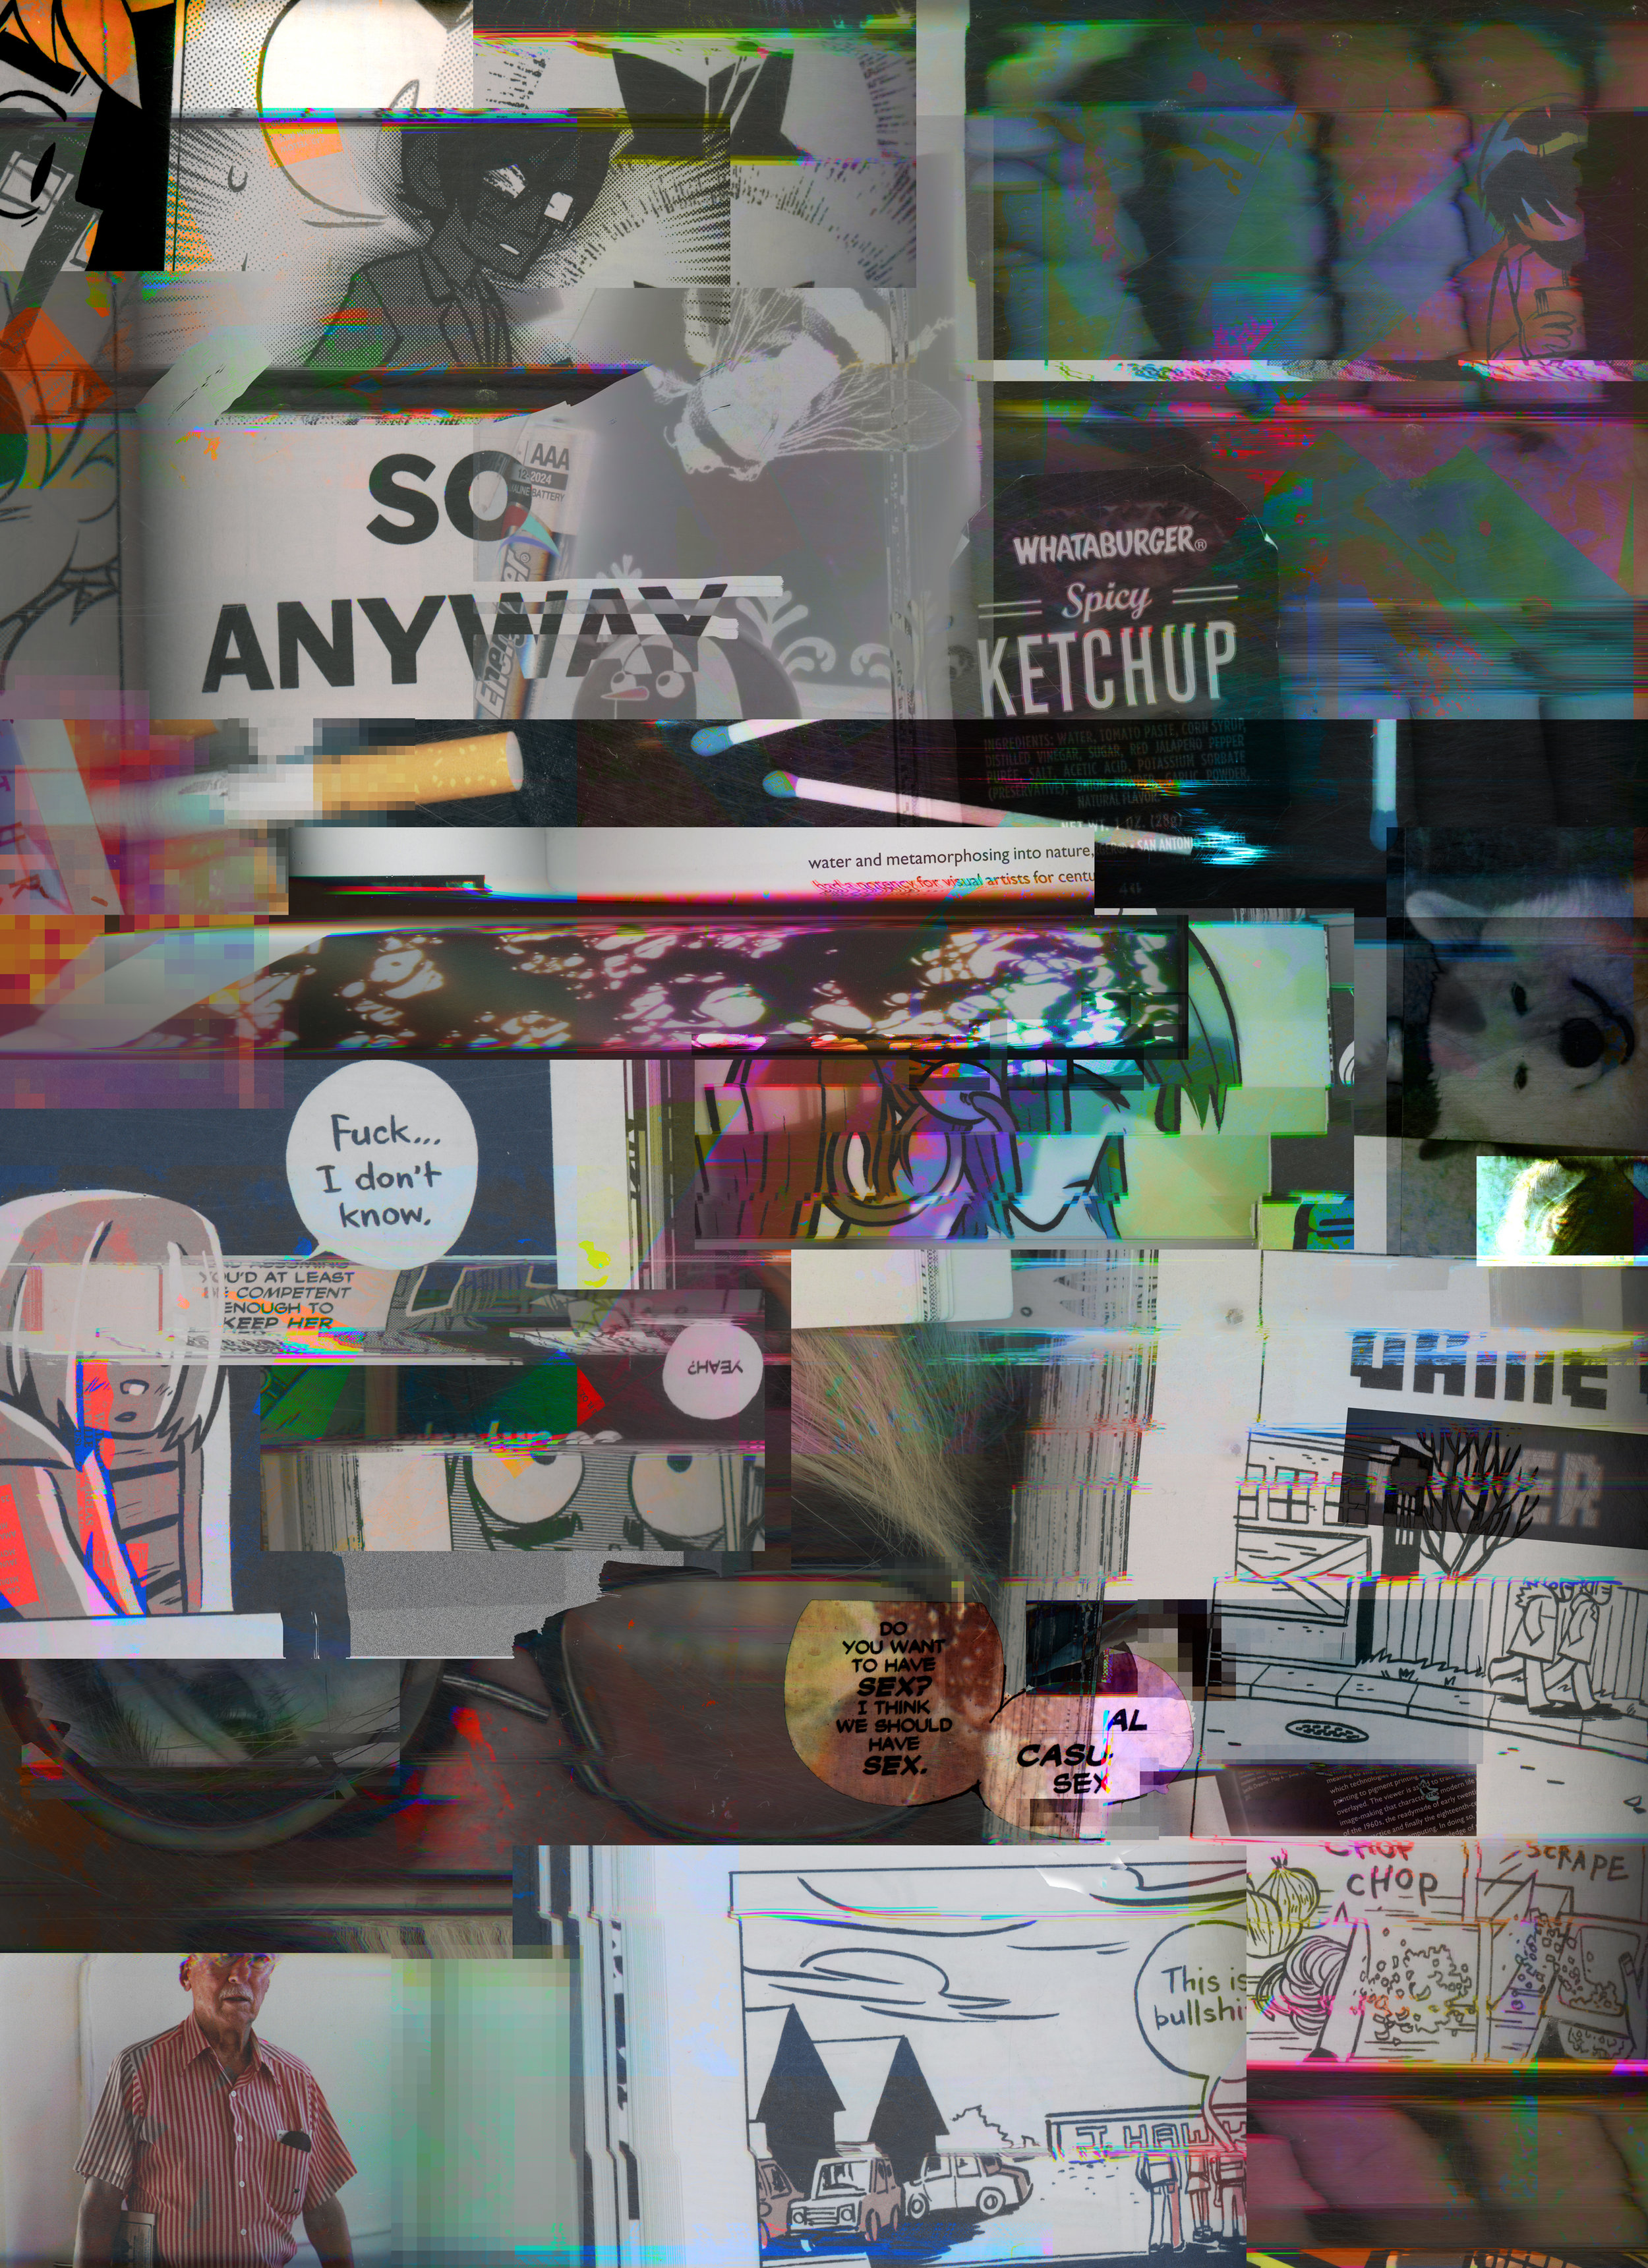 Autobiographical Data Dump, 2016, Inkjet print, 4' x 5'